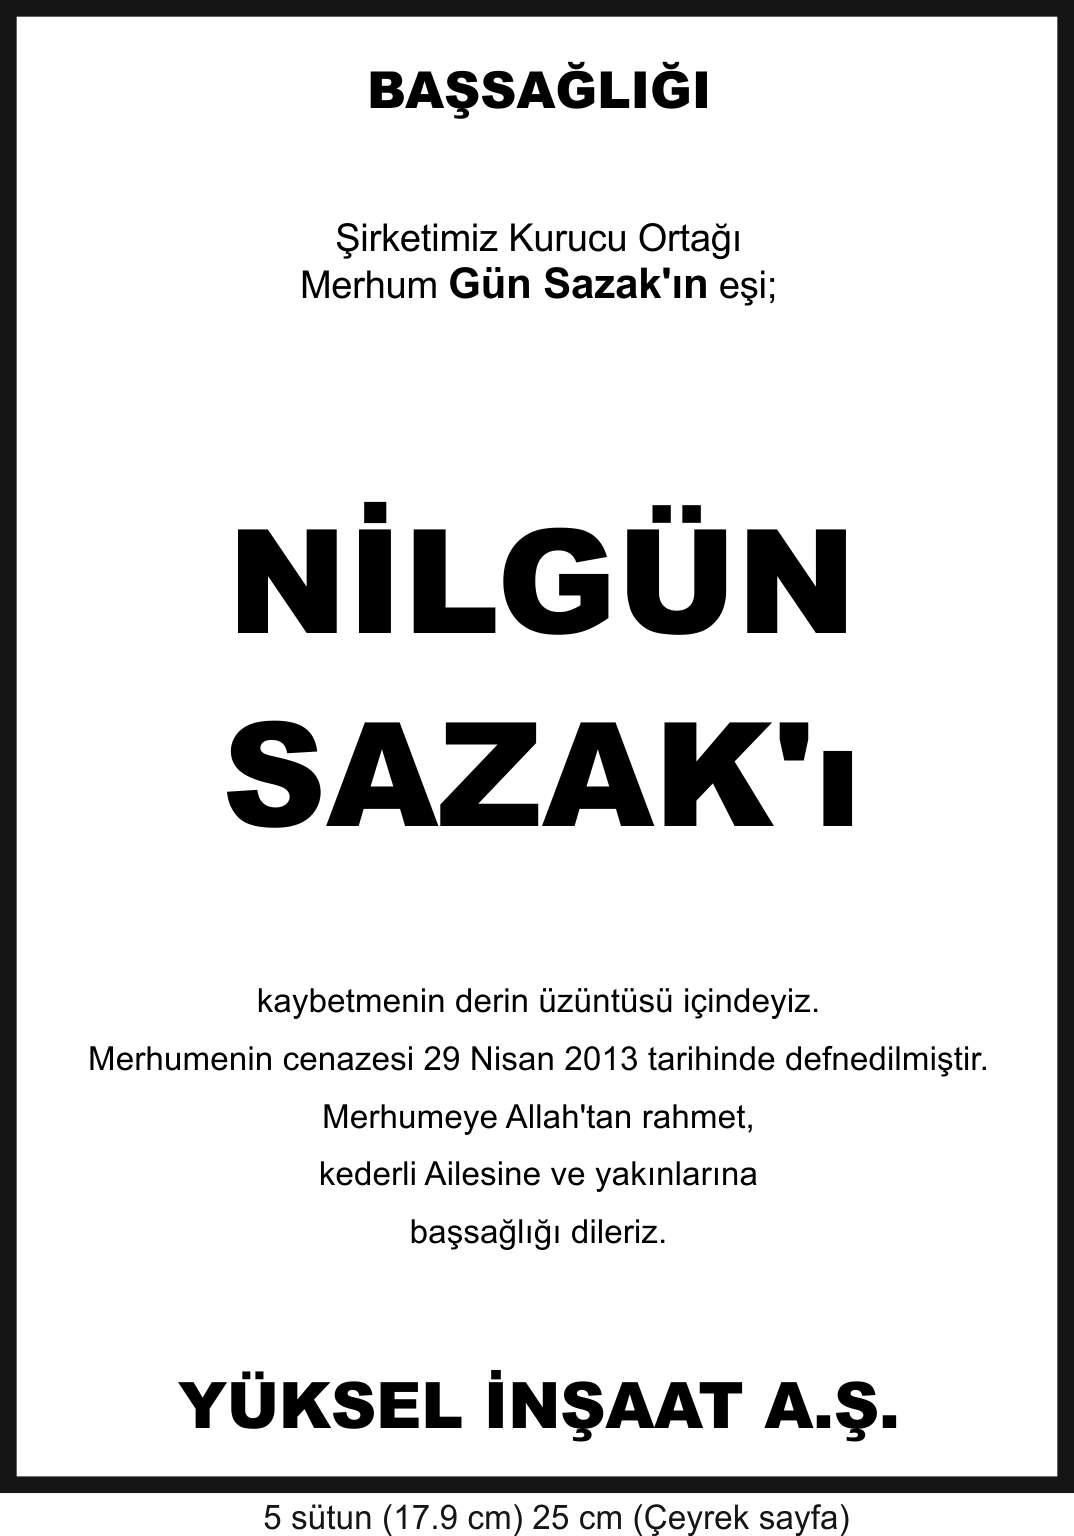 Hurriyet-vefat-ilani-Nilgn-Sazak-basal-ilan-yksel-inaat